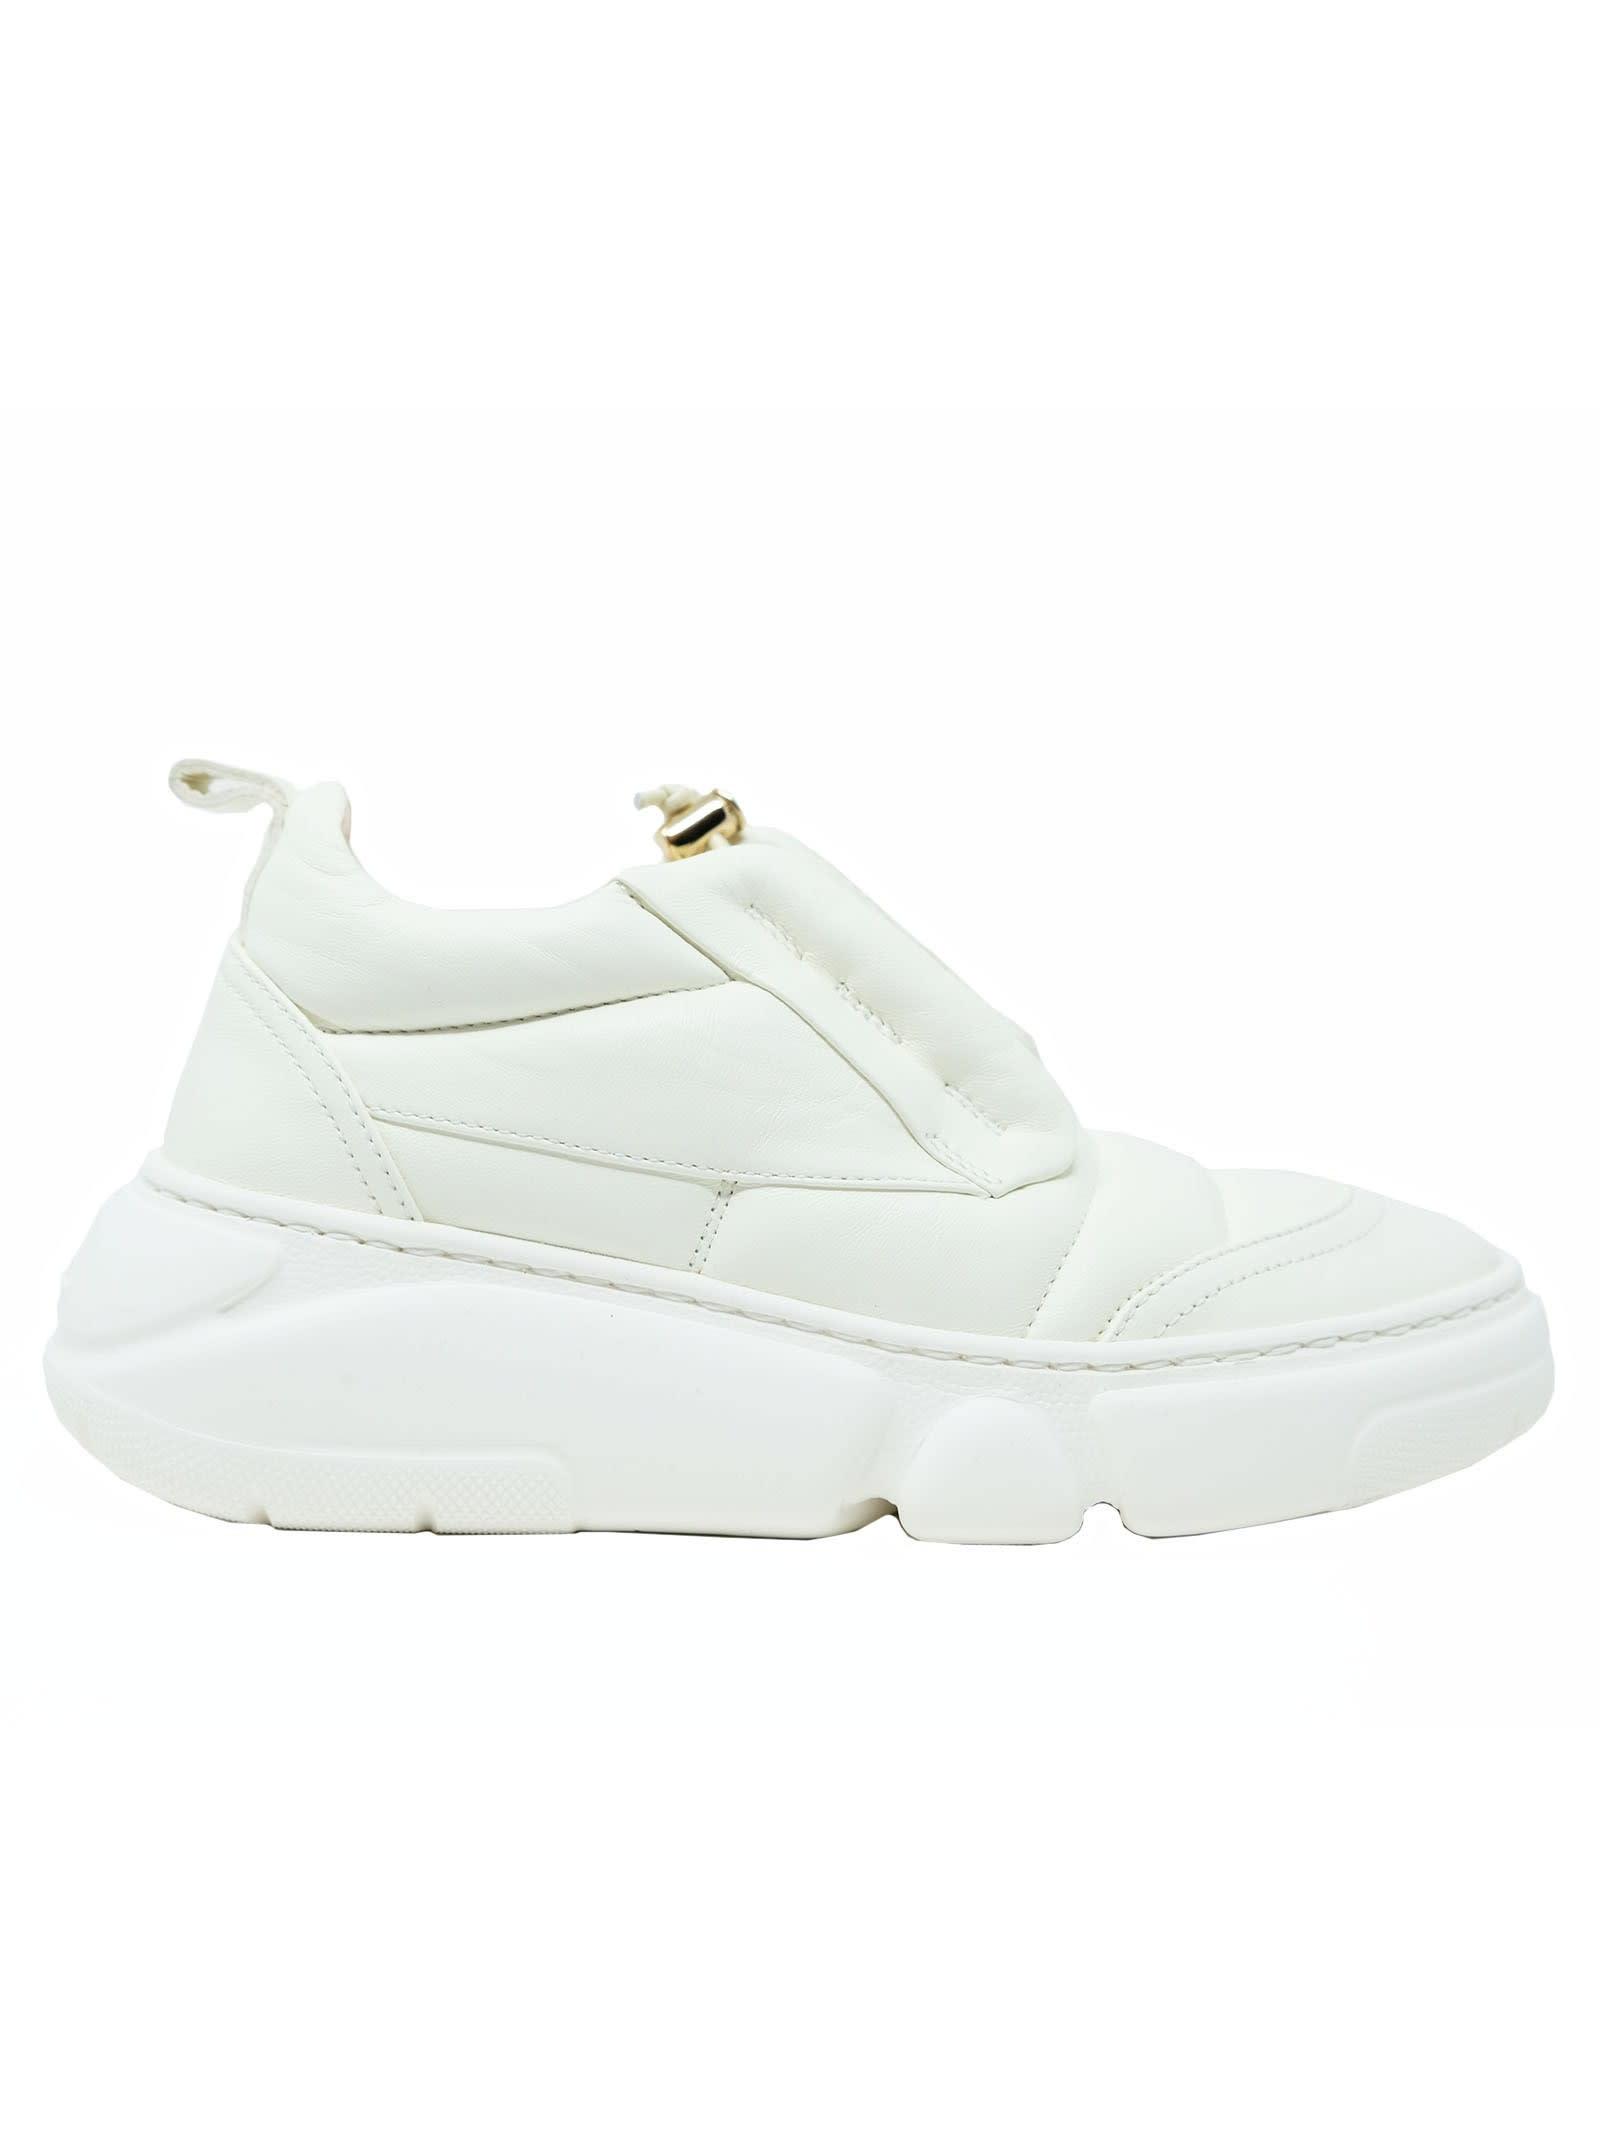 Agl Leather Venus Sneakers